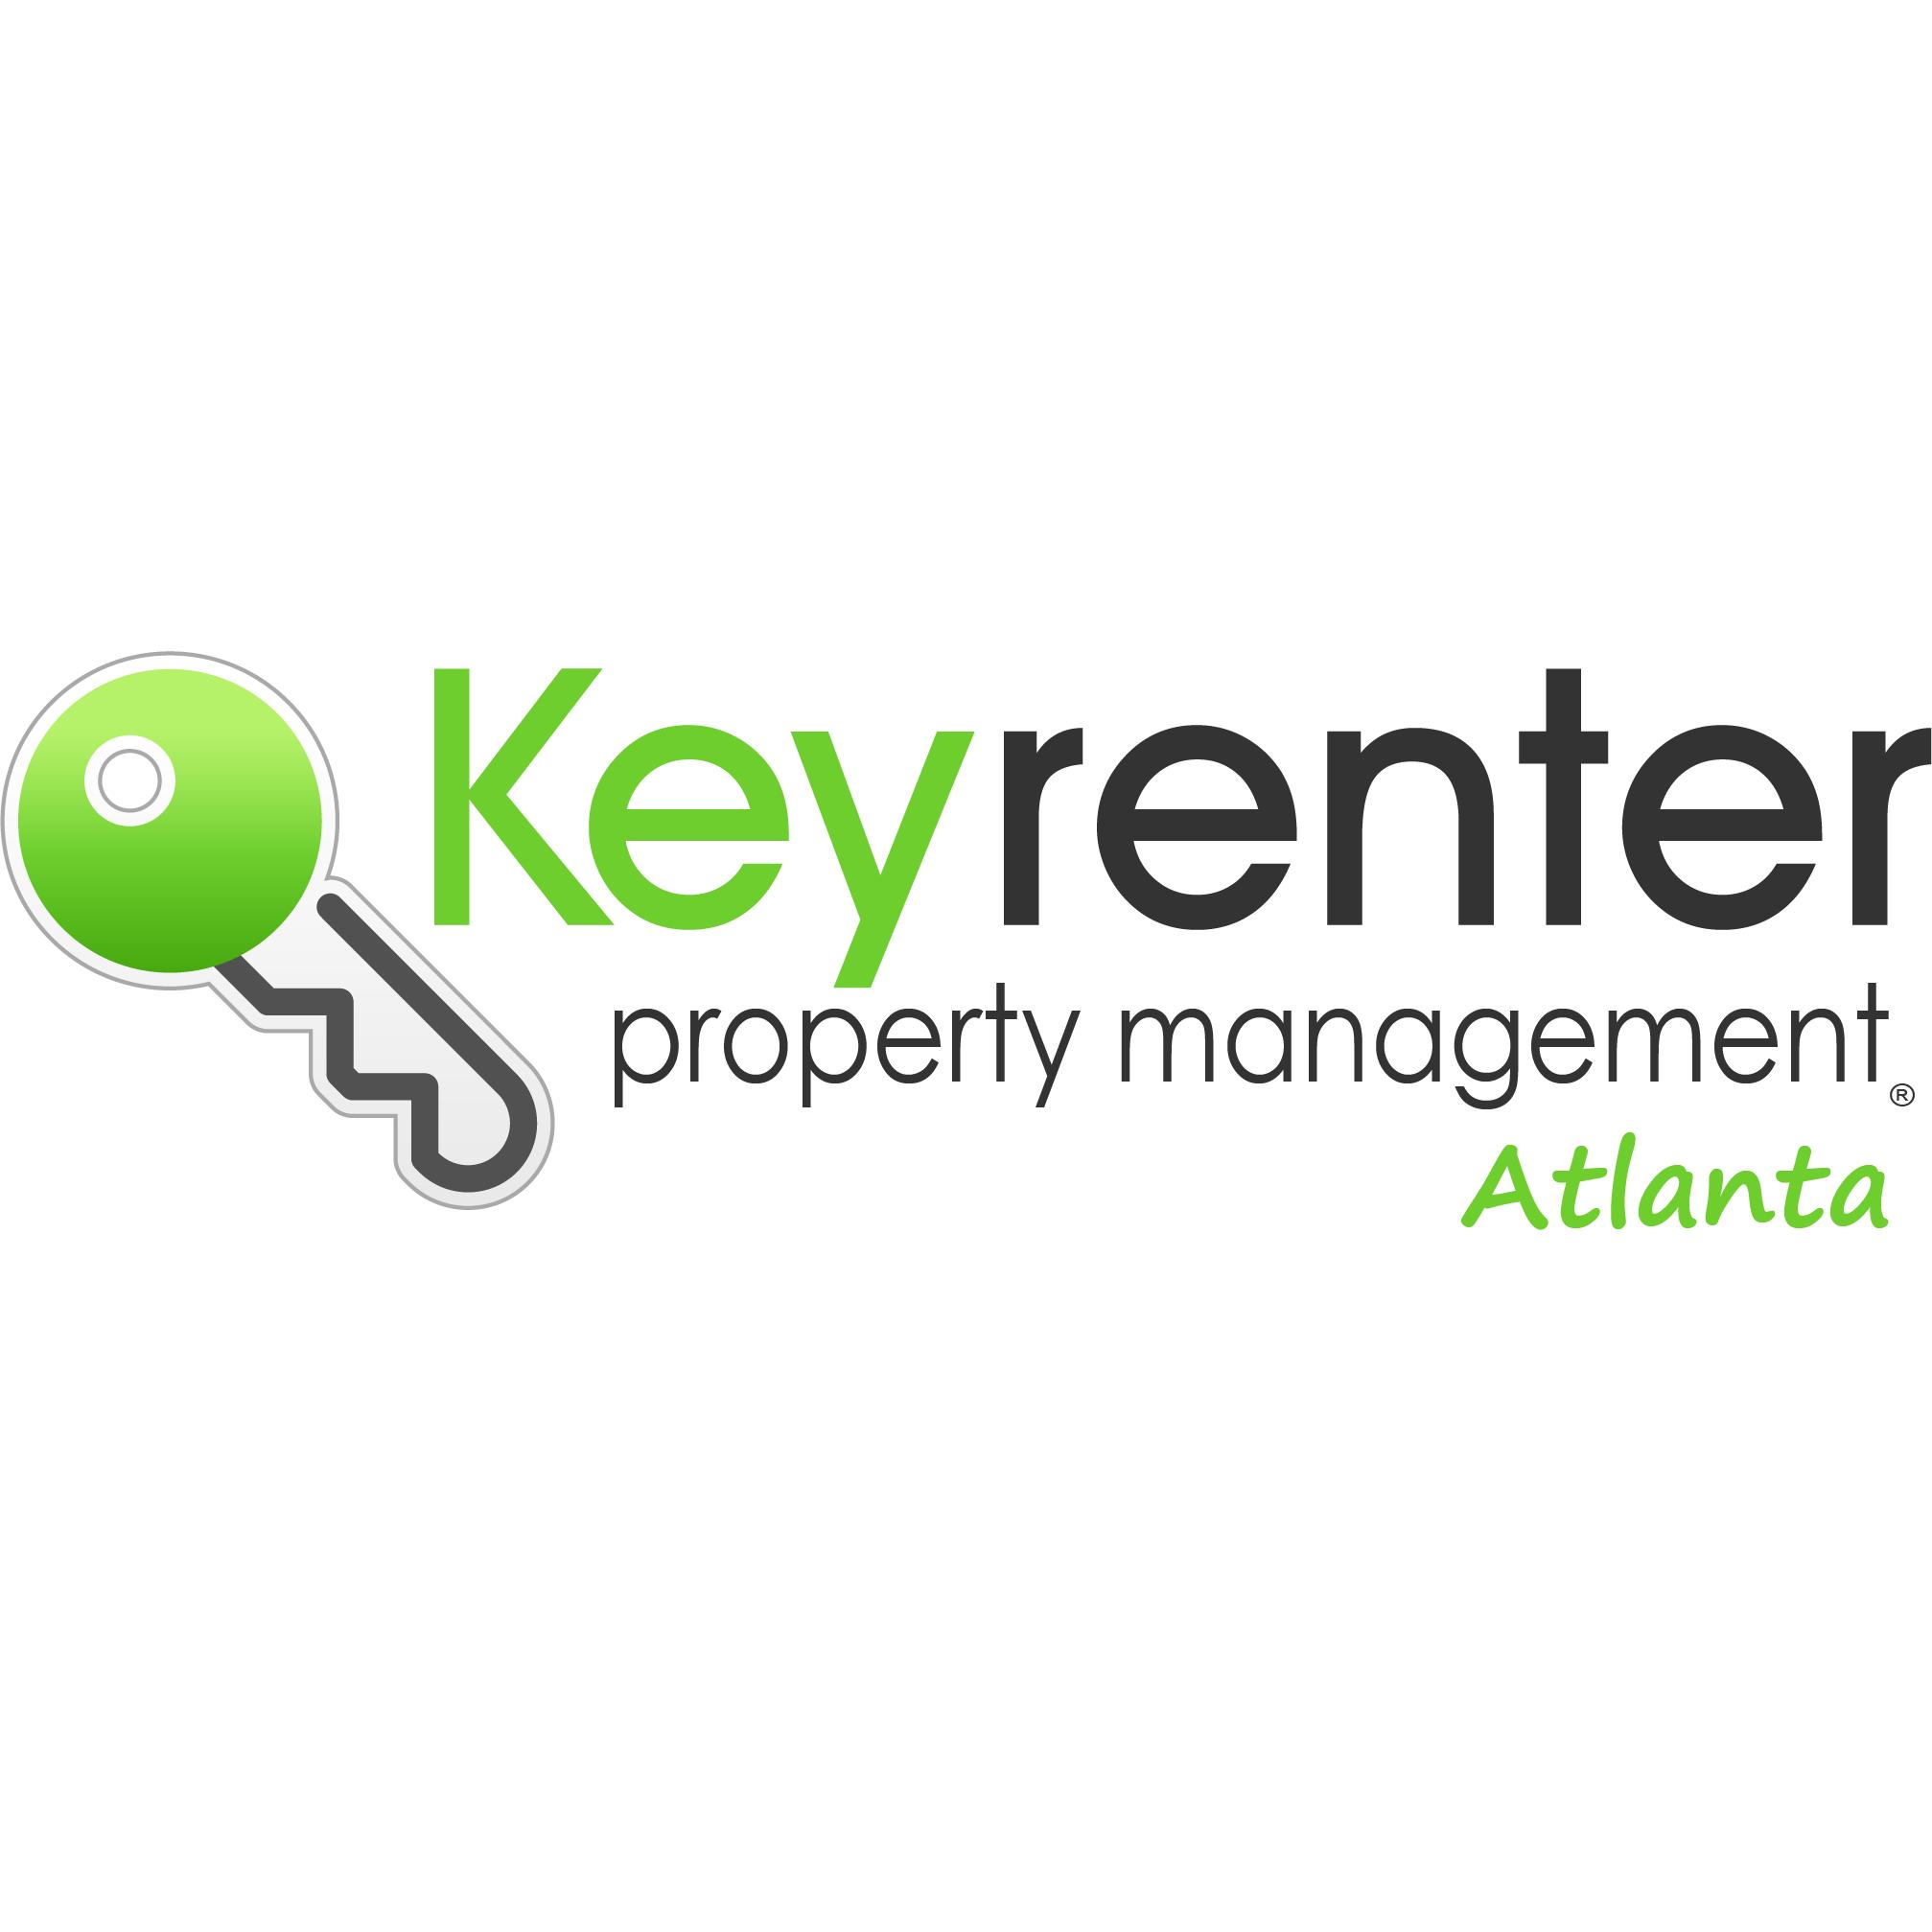 Keyrenter Property Management Atlanta image 0